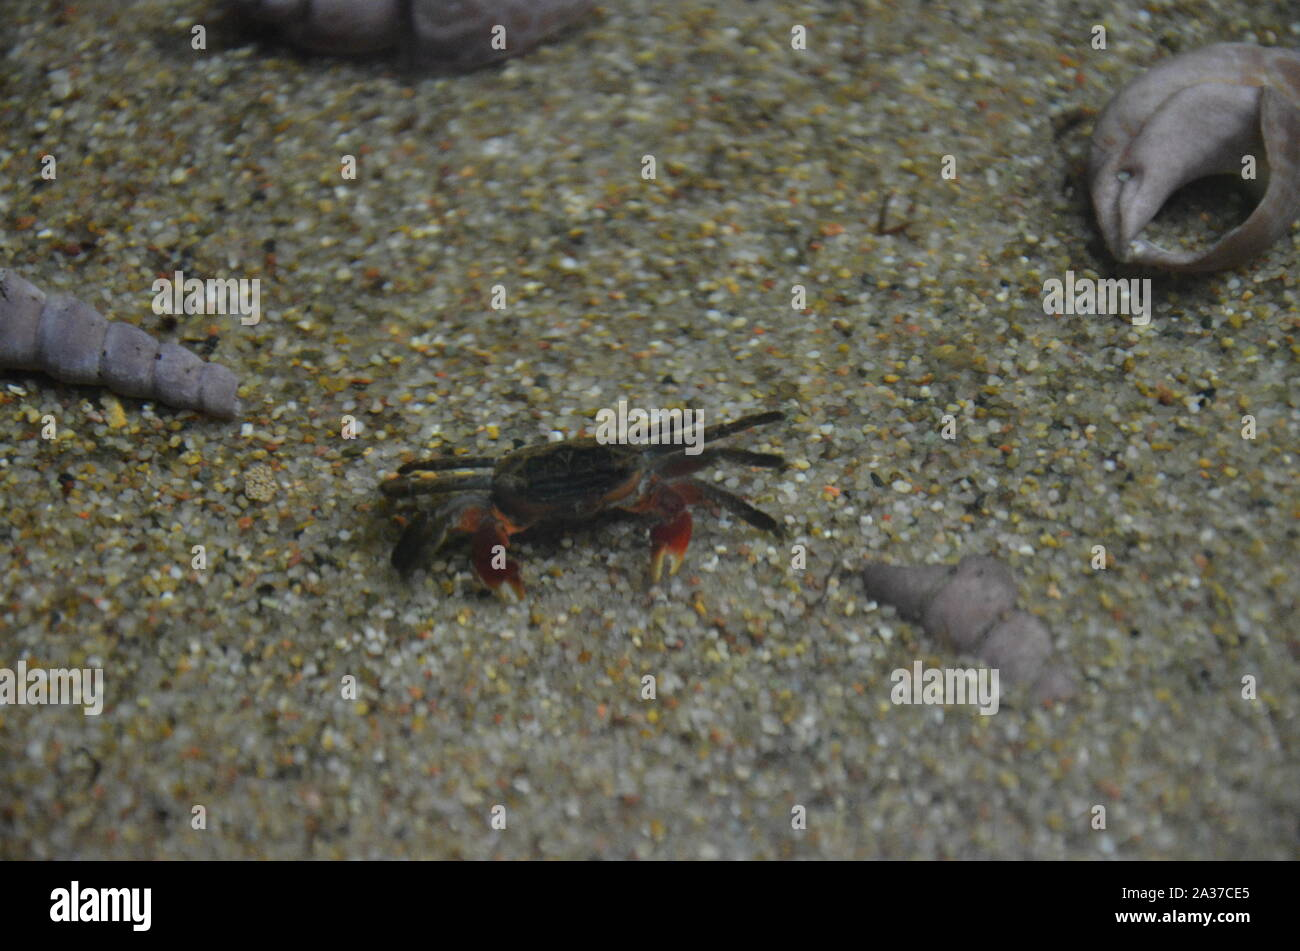 The marine life in aquarium of Berlin (Germany) Stock Photo